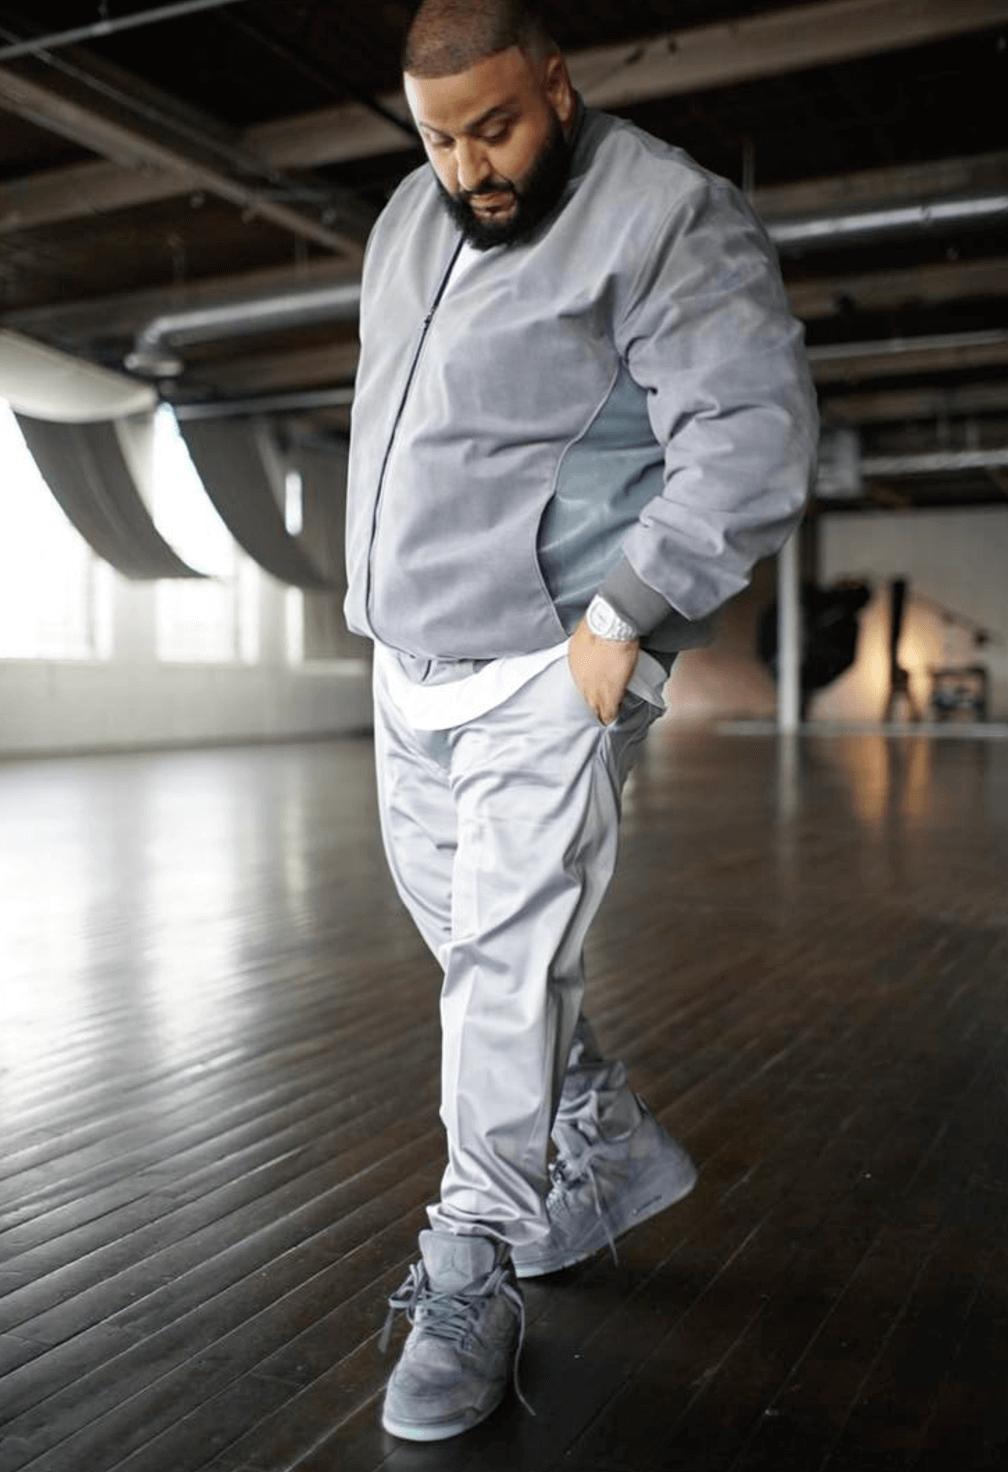 DJ Khaled in Kaws x Air Jordan 4 Retro